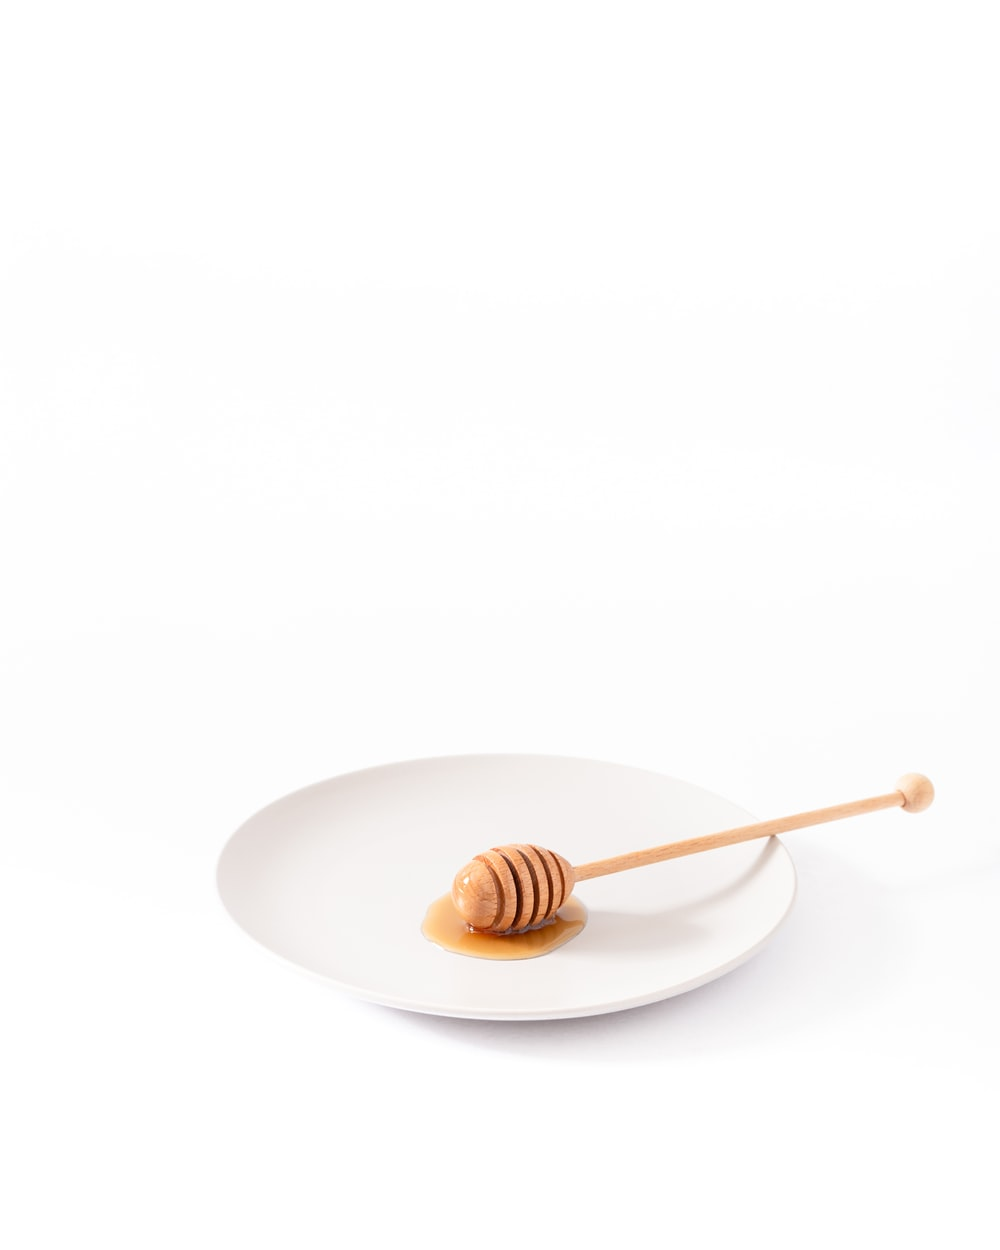 honey dipper on empty plate